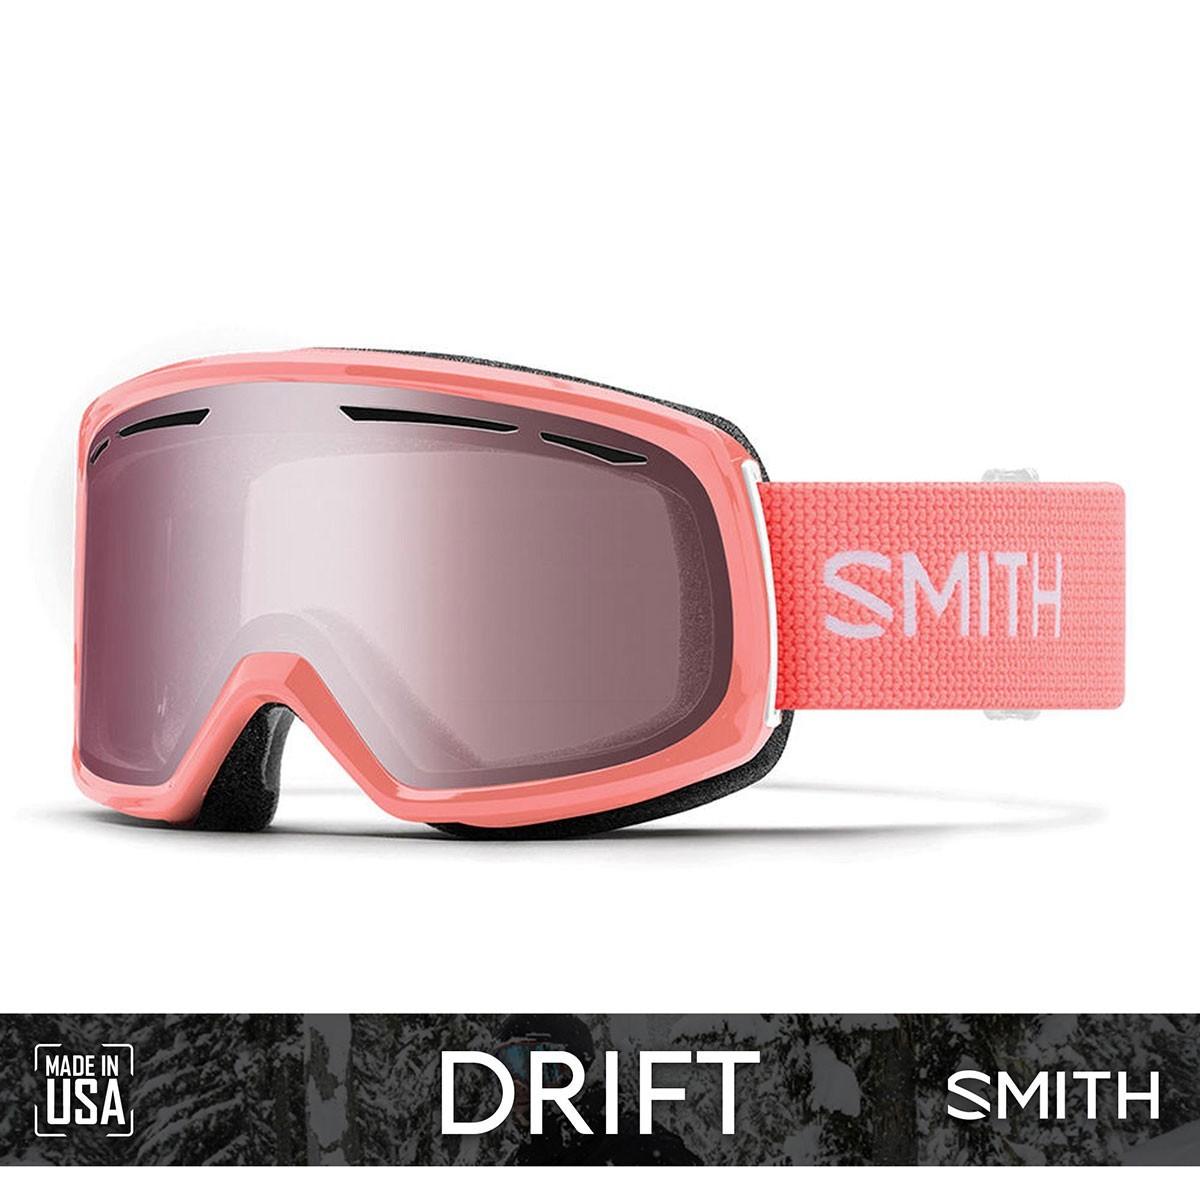 SMITH DRIFT Sunburst Split   S2 IGNITOR Mirror - Изображение - AQUAMATRIX